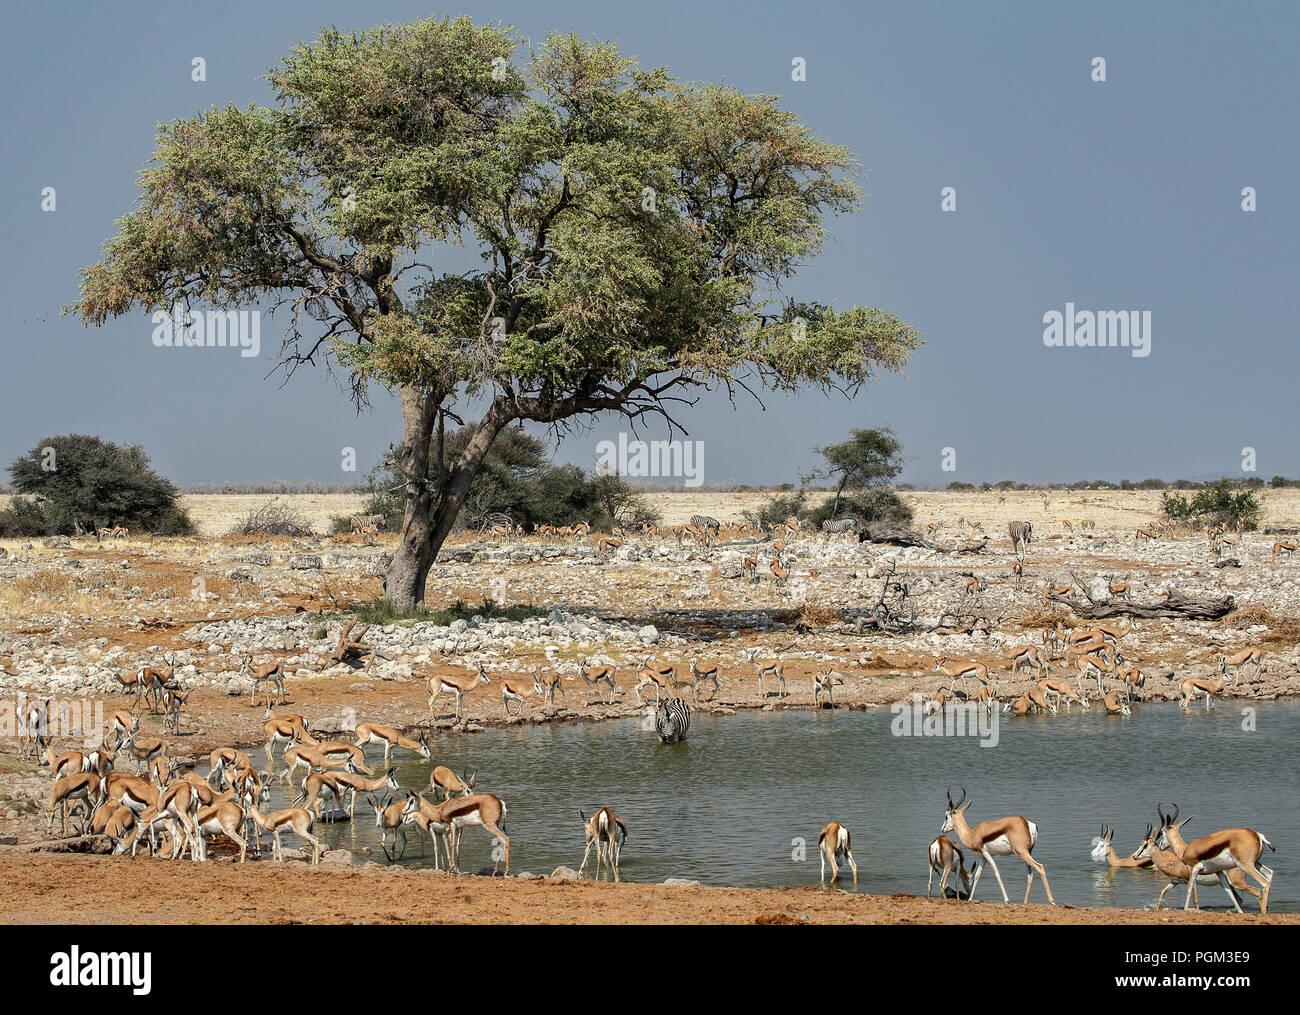 Herd of Springbok - Antidorcas marsupialis - drinking at Okaukeujo waterhole in Etosha, Namibia. Large tree in background. - Stock Image